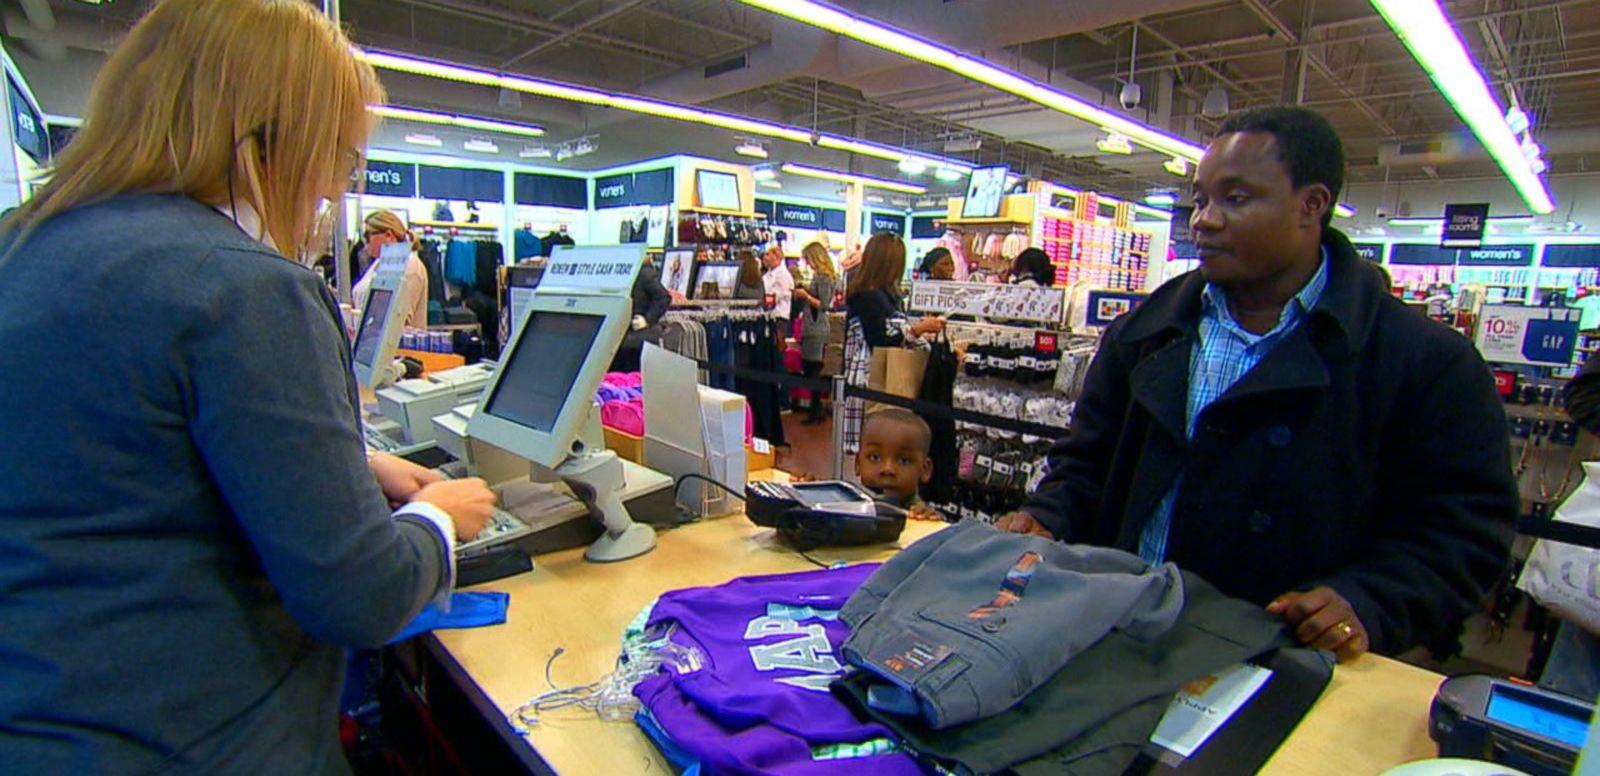 VIDEO: Retailers Prepare for Big Post-Christmas Returns